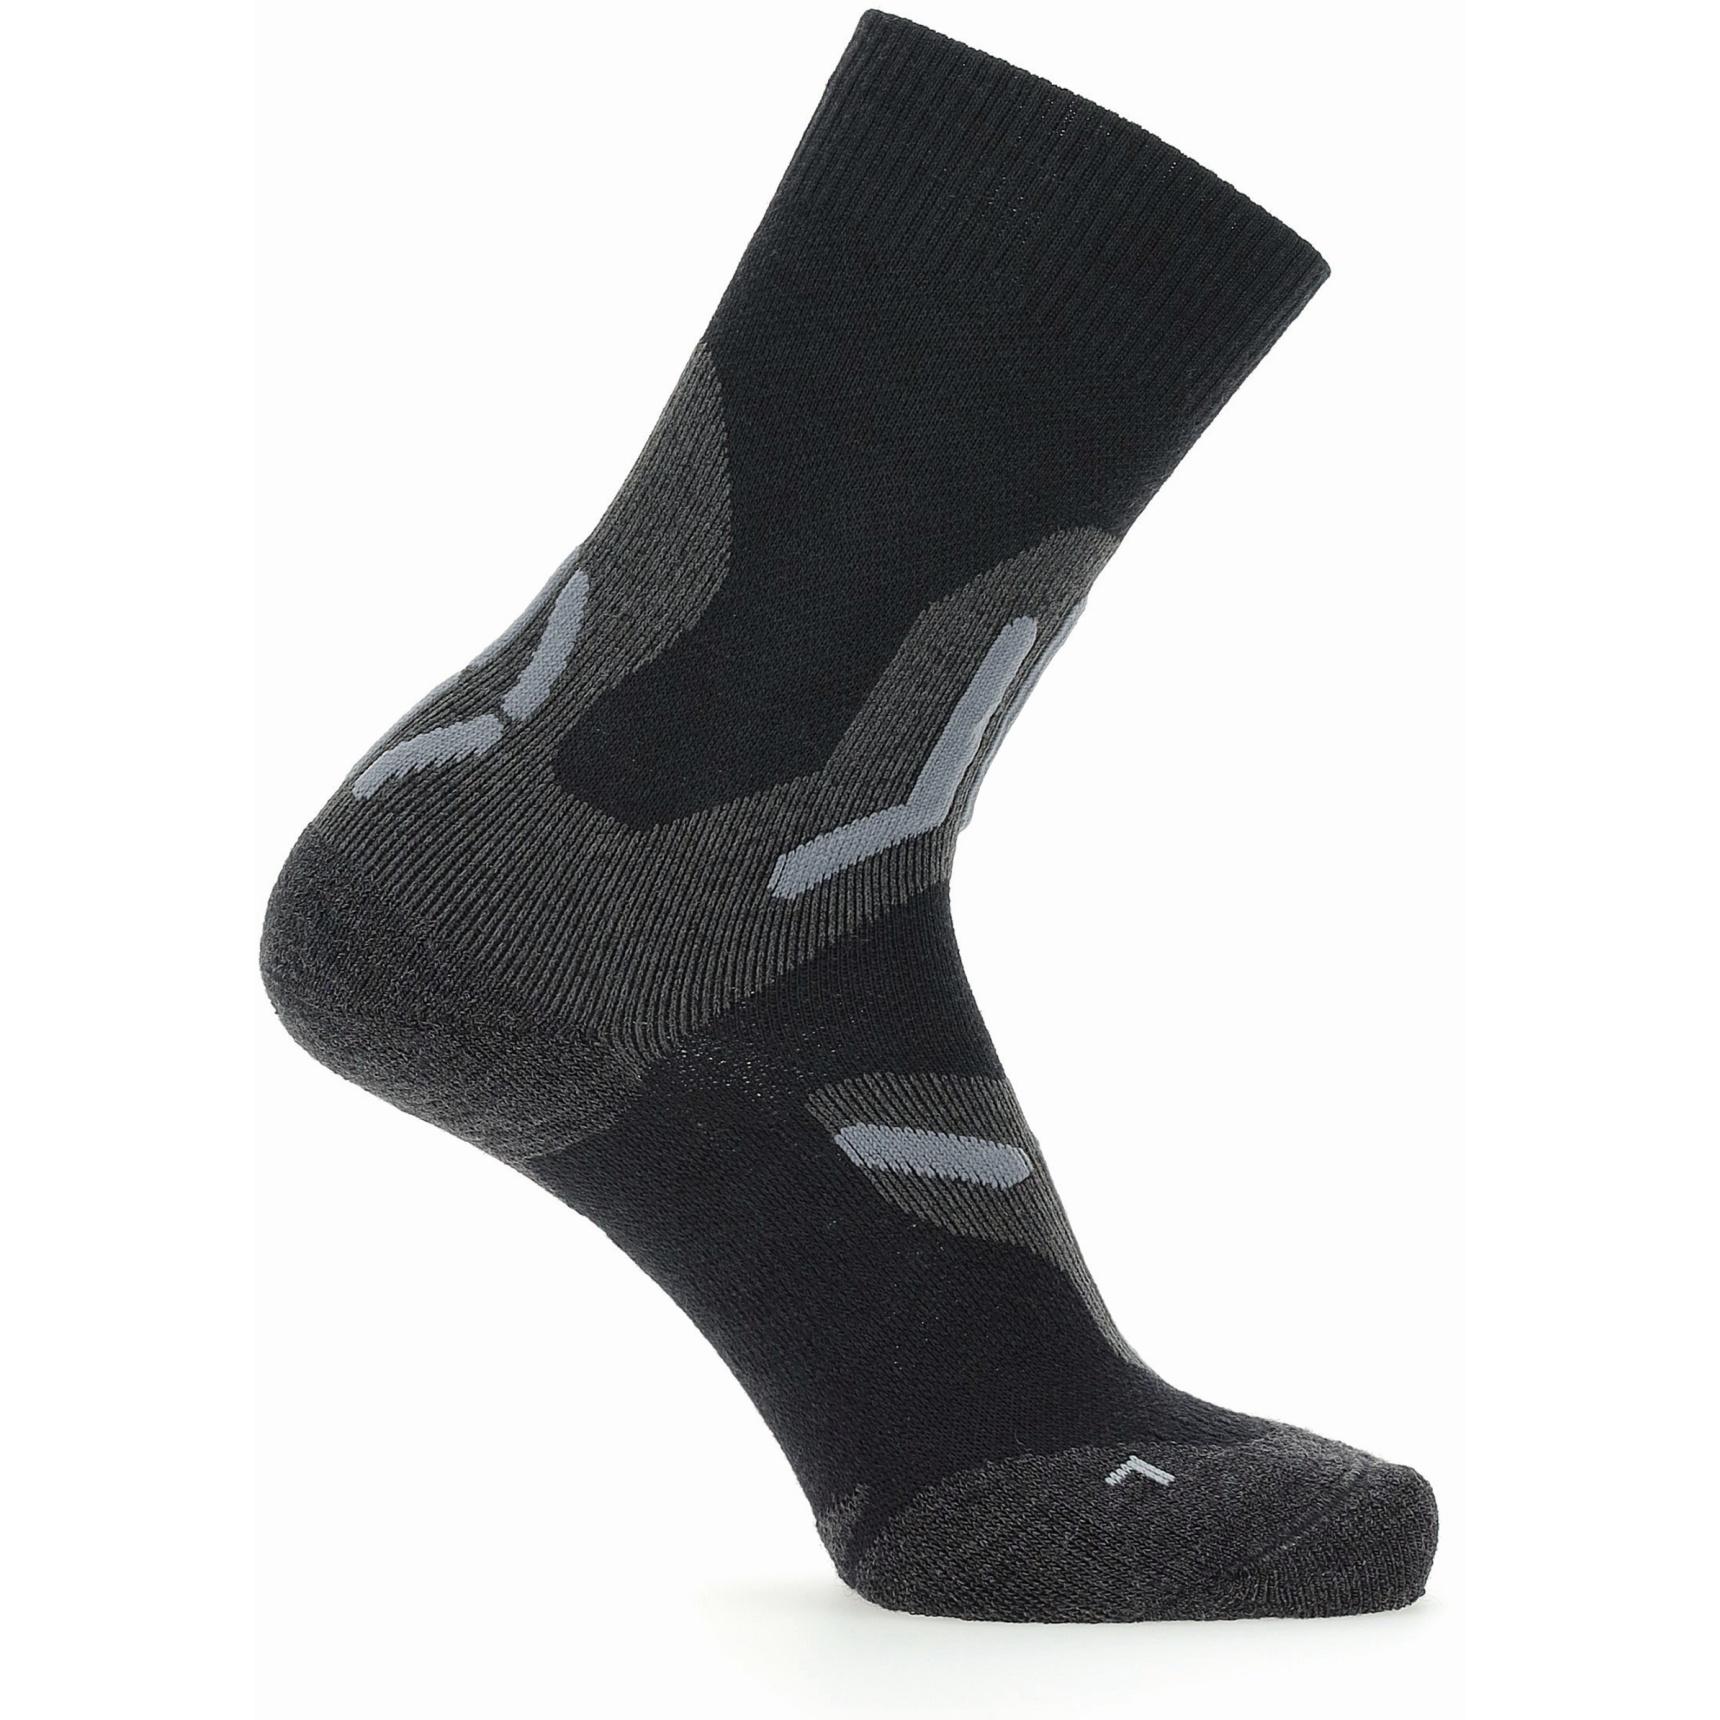 Image of UYN Trekking 2In Merino Mid Cut Socks Women - Black/Grey